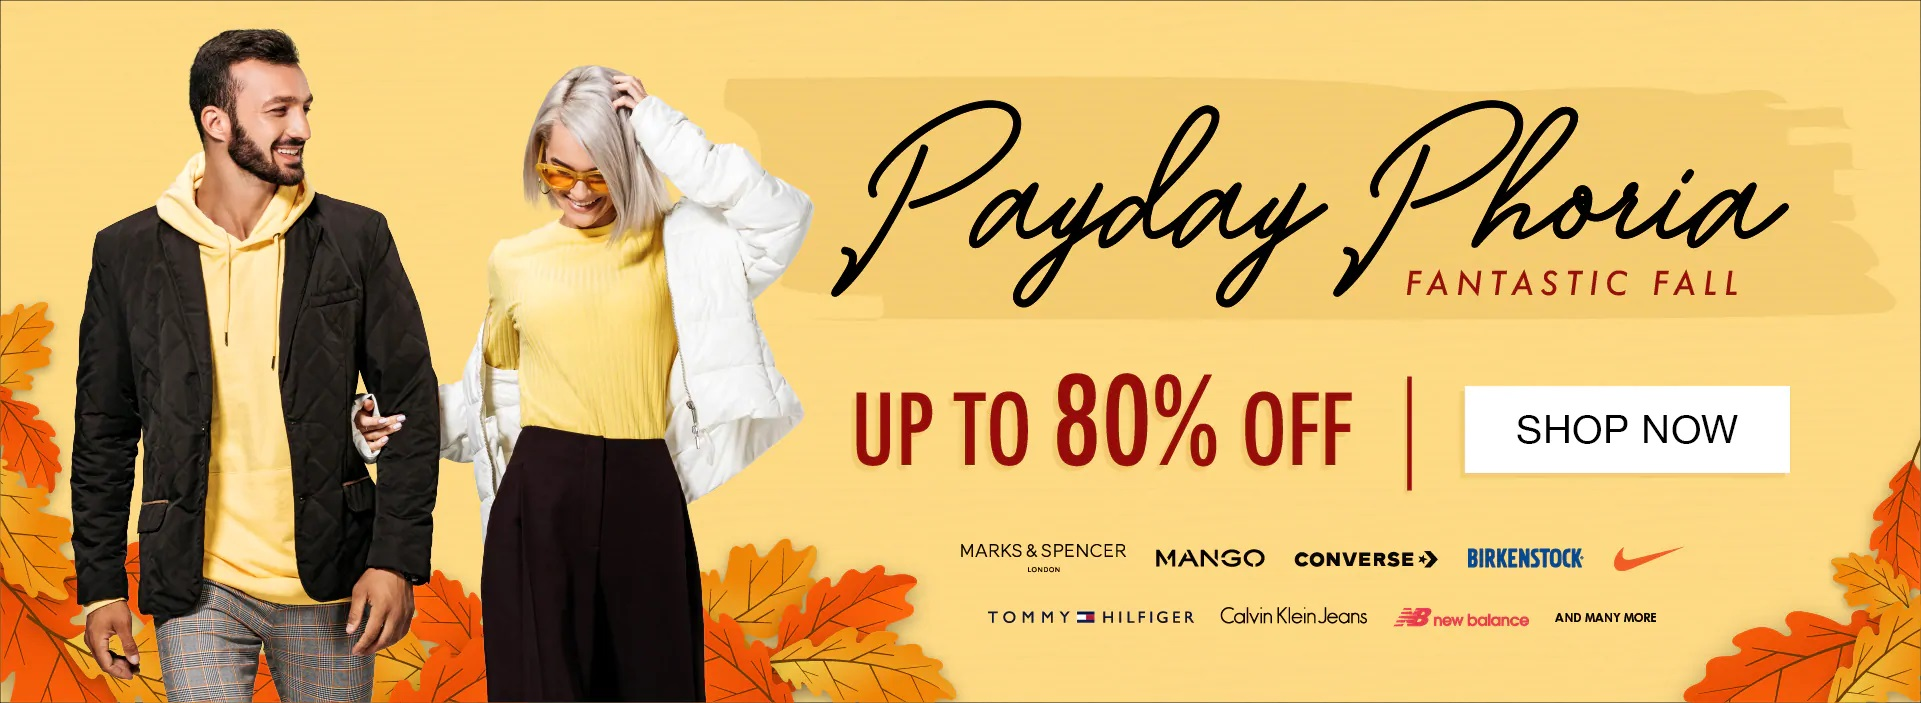 MAP E-Mall Promo Payday Phoria, Diskon Hingga 80%